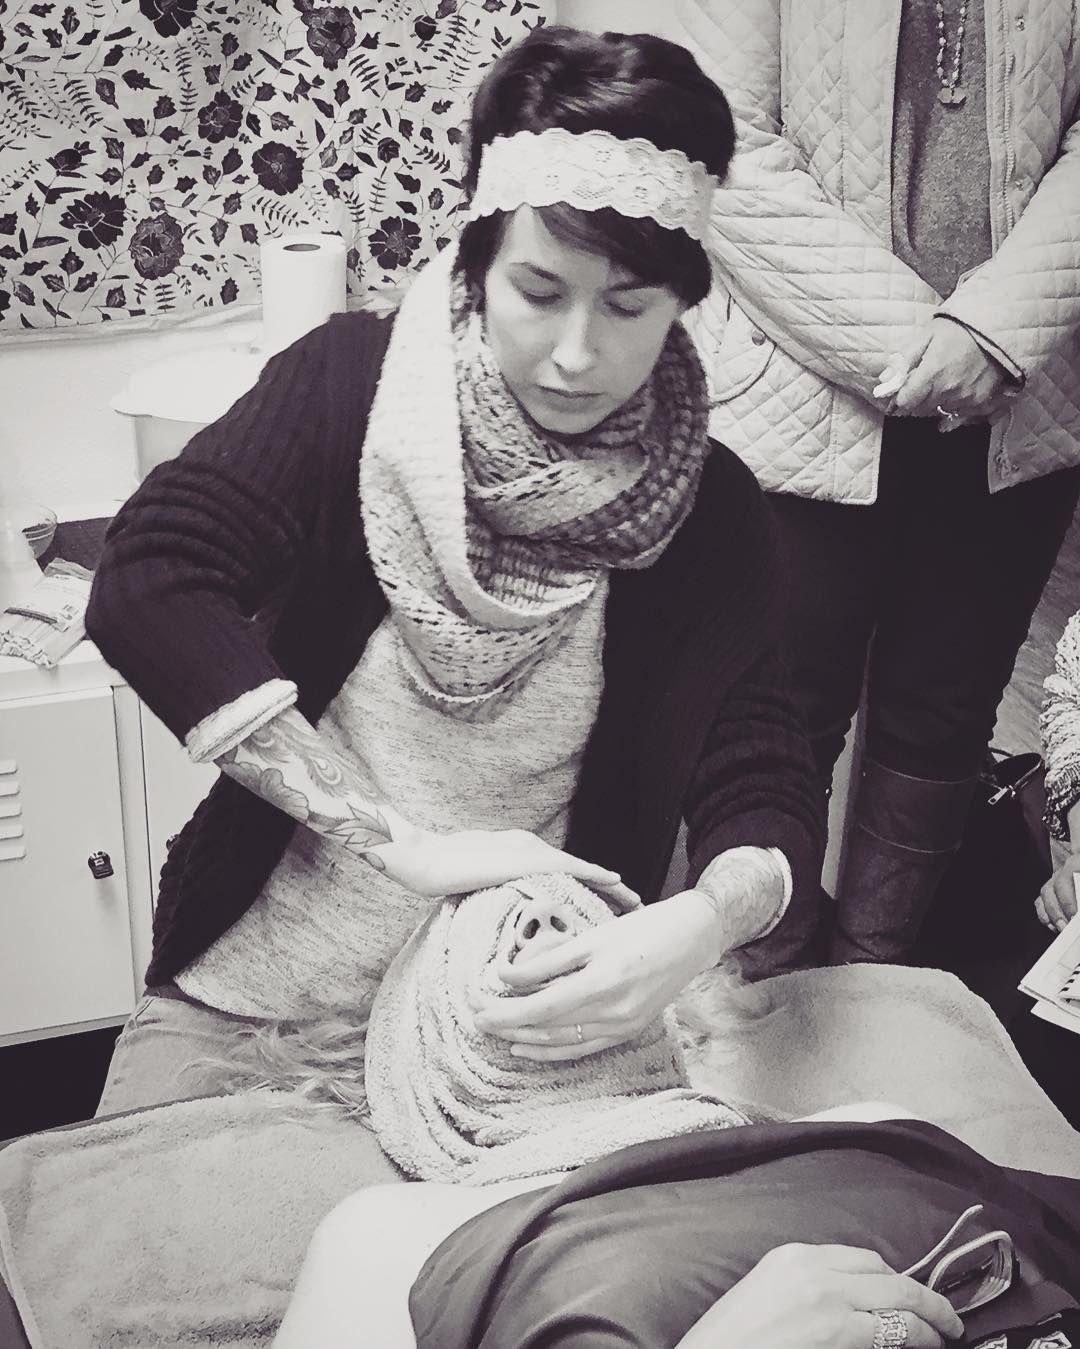 Untitled beauty skin care beauty treatments instagram